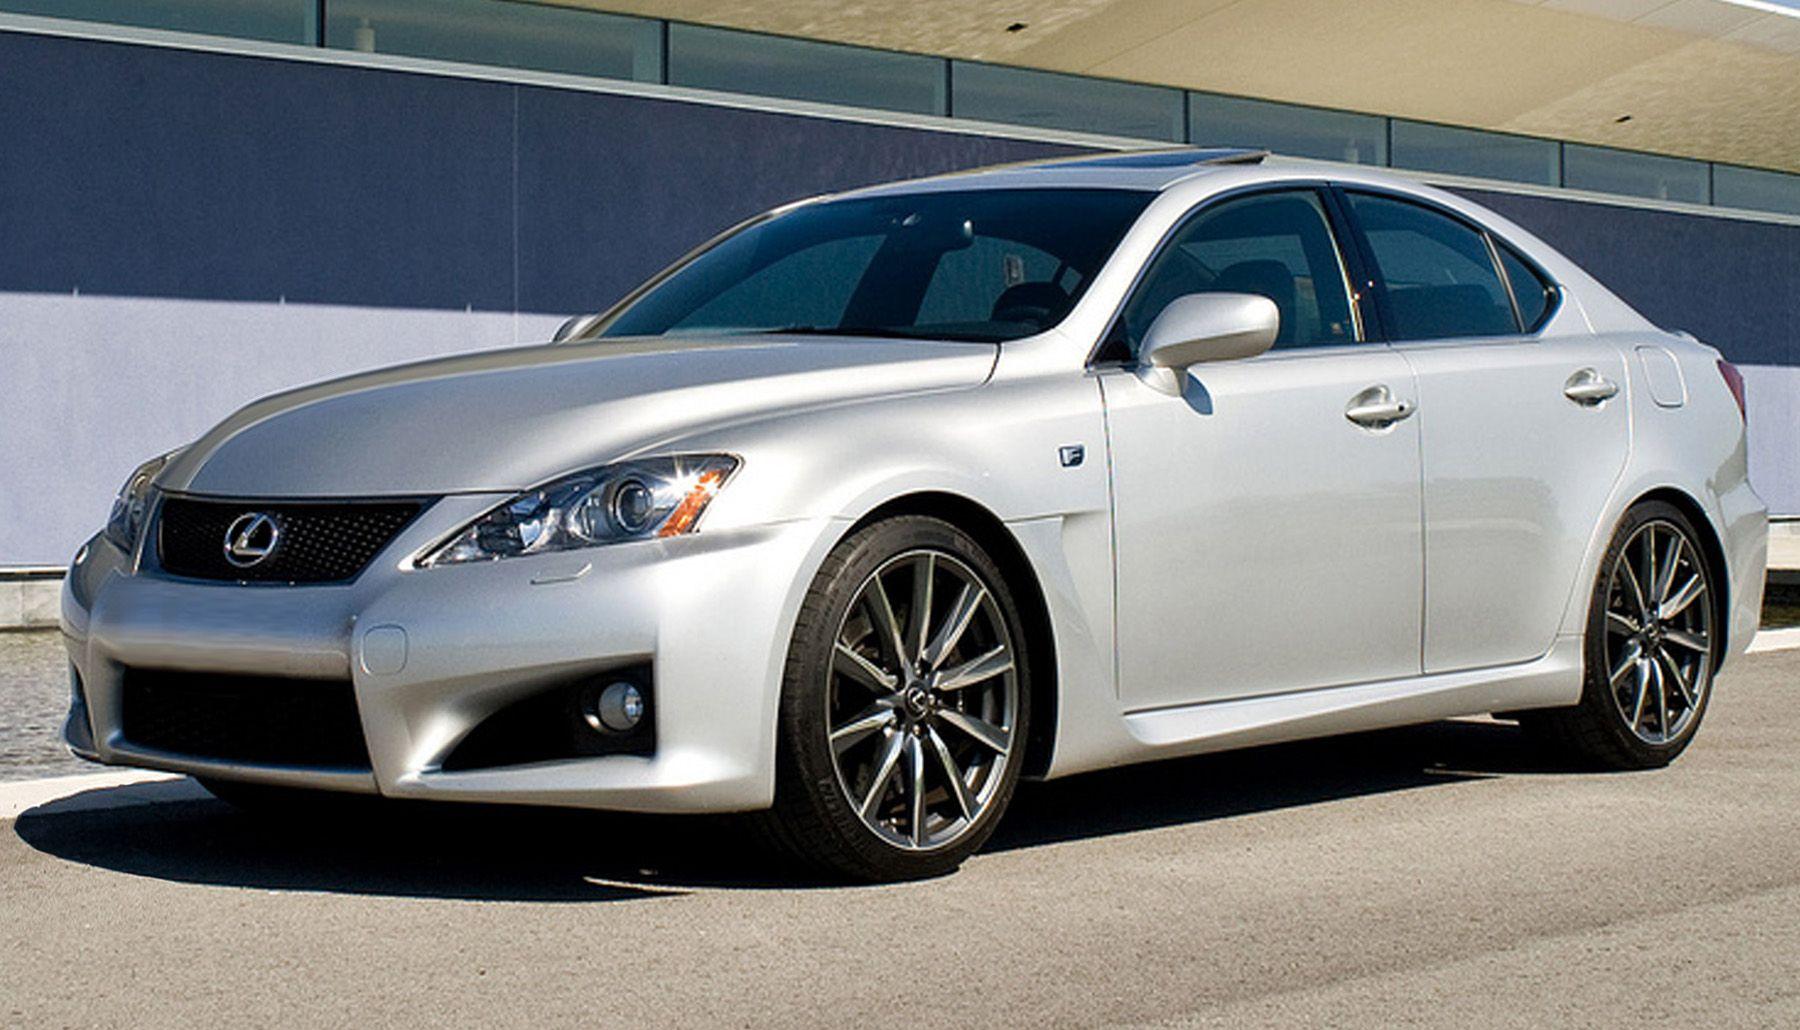 Lexus Gx Hd Wallpapers High Resolution Car Wallpapers Lexus Gx Lexus Lexus Isf